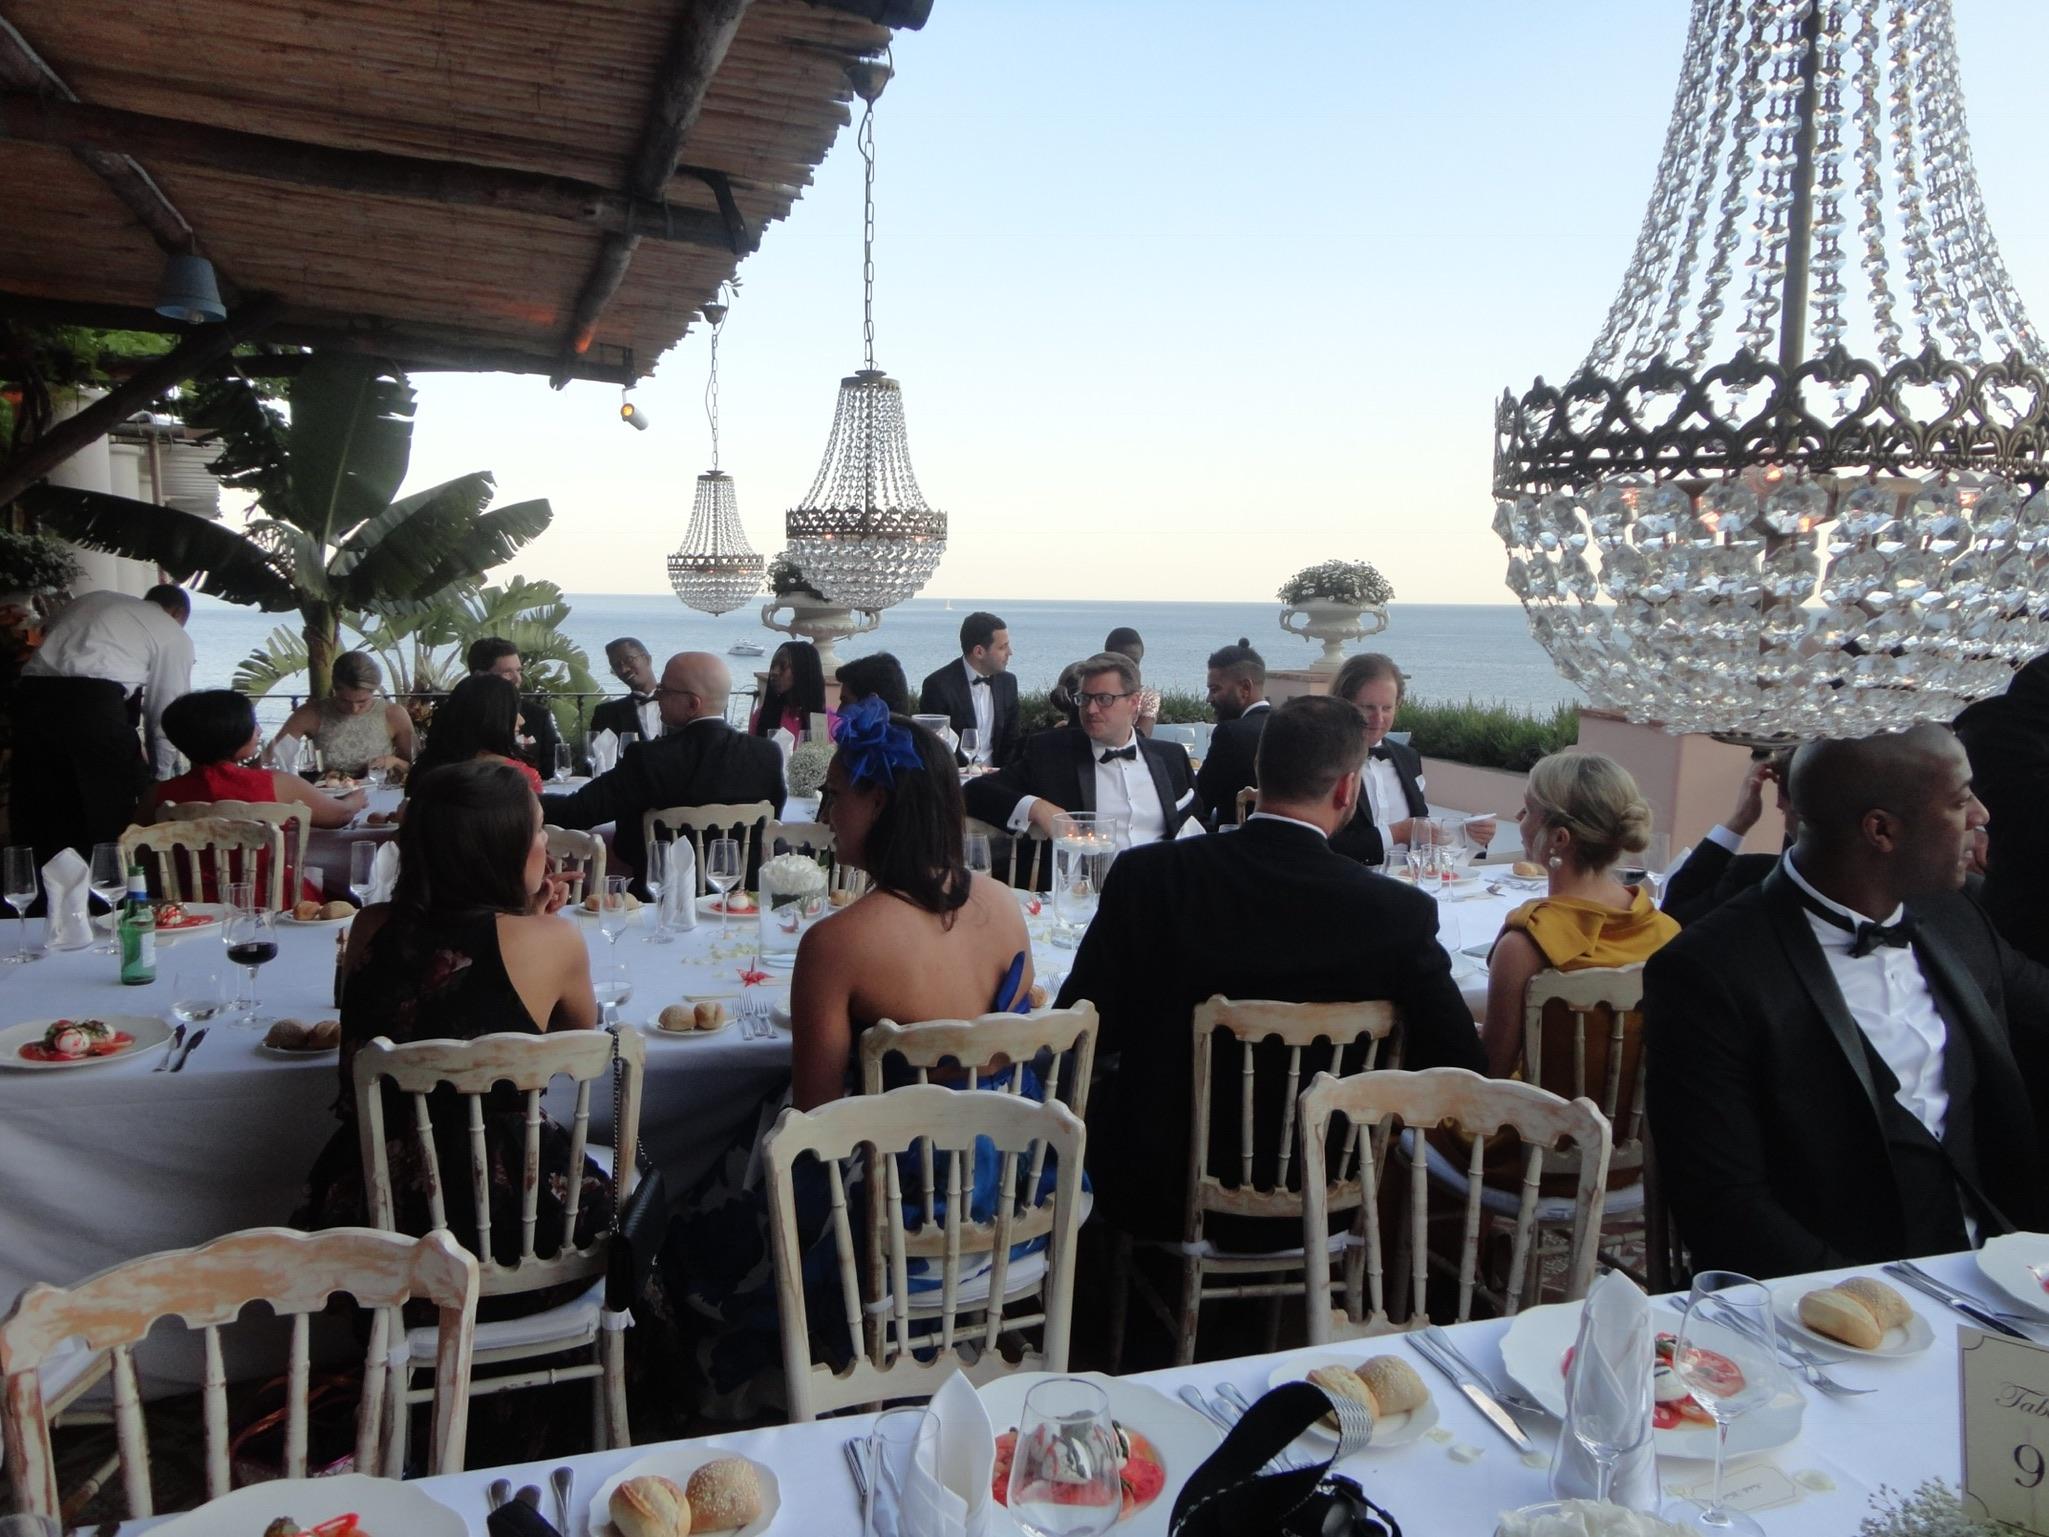 https://www.weddingamalfi.com/wp-content/uploads/Nathalie-and-Benjamin-Wedding-in-Positano-Italy-9.jpg